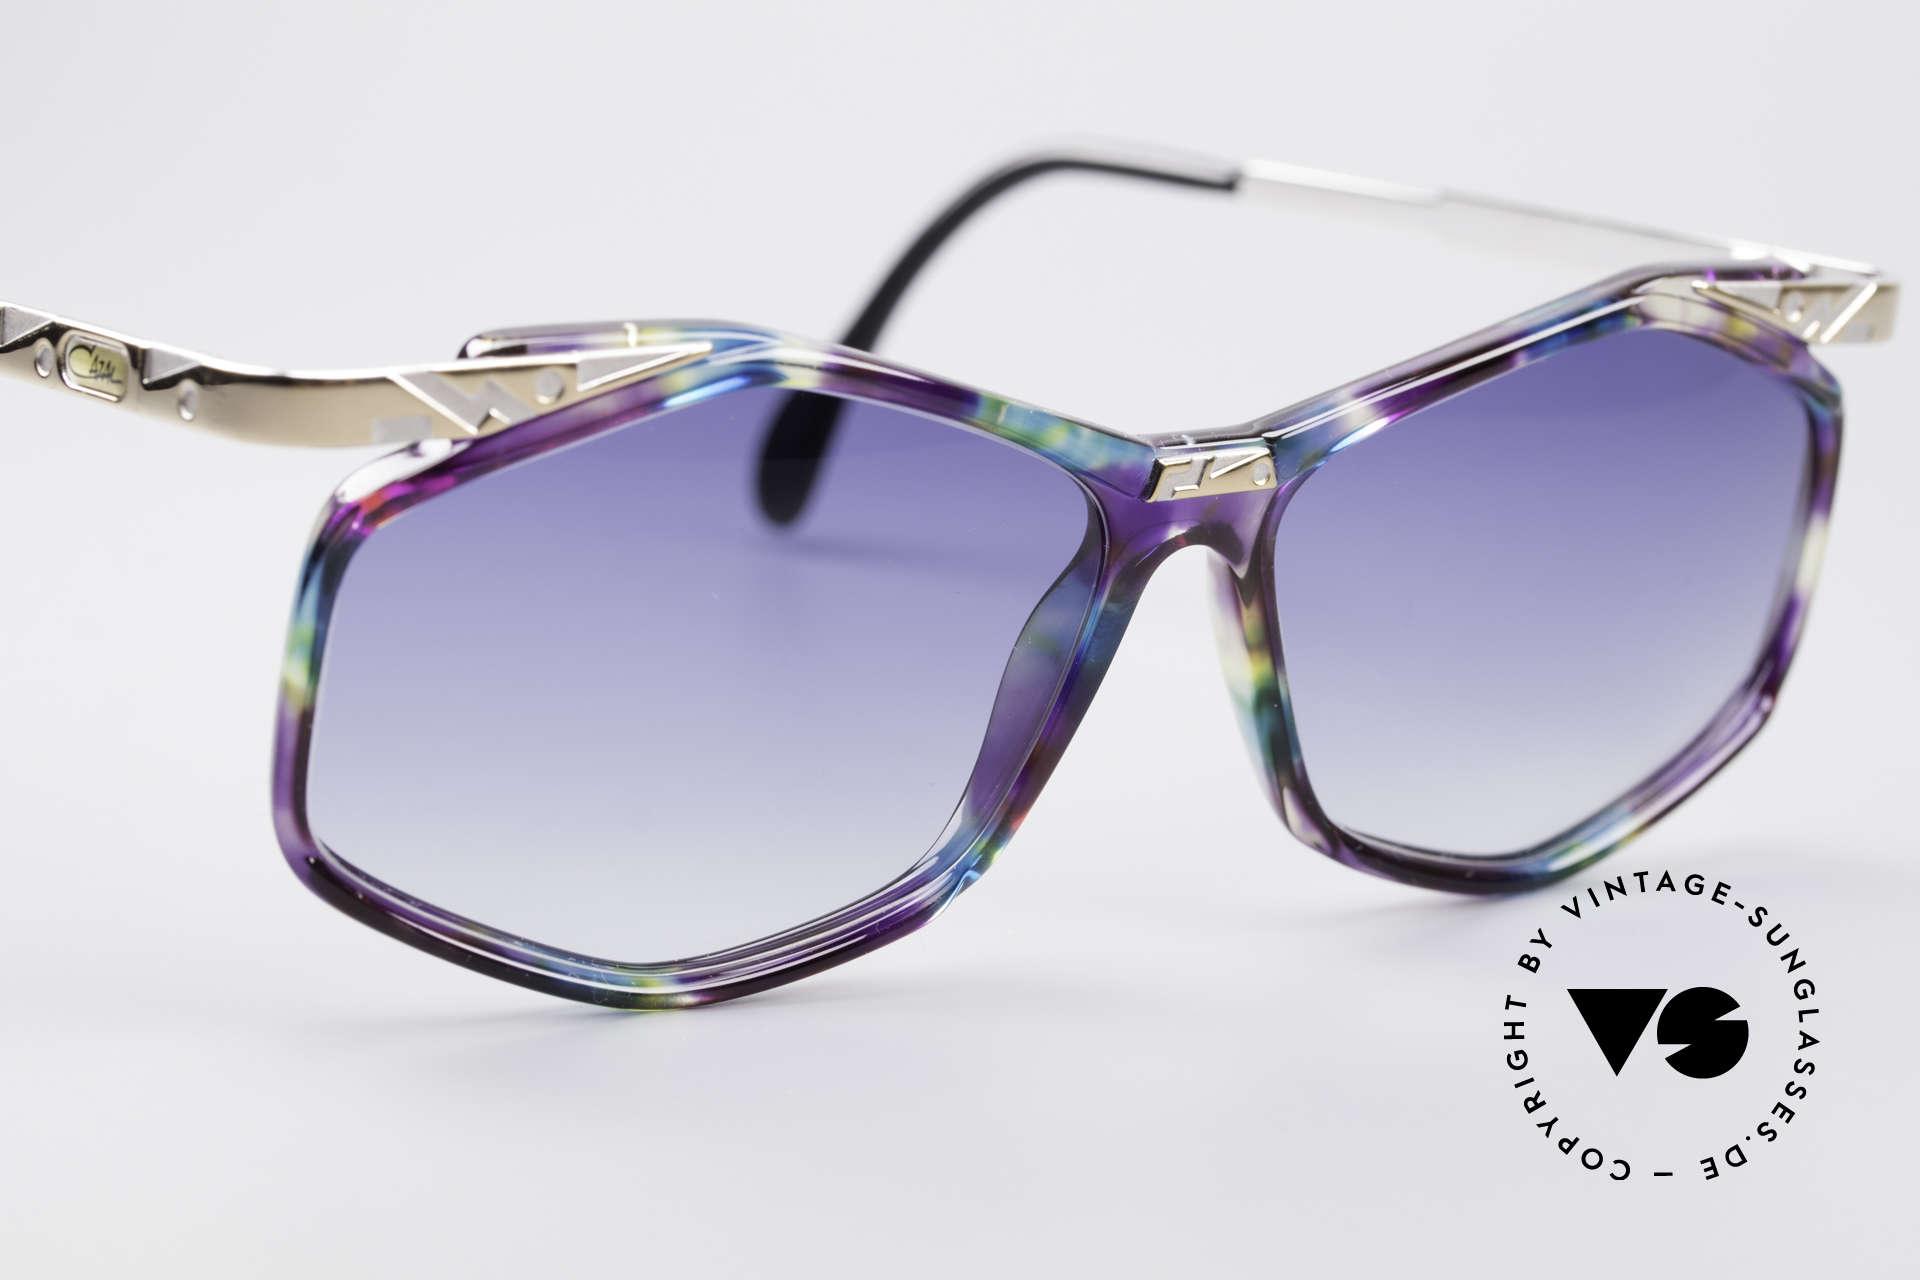 Cazal 354 Vintage Designer Sunglasses, NO RETRO sunglasses, but a 25 years old ORIGINAL, Made for Women